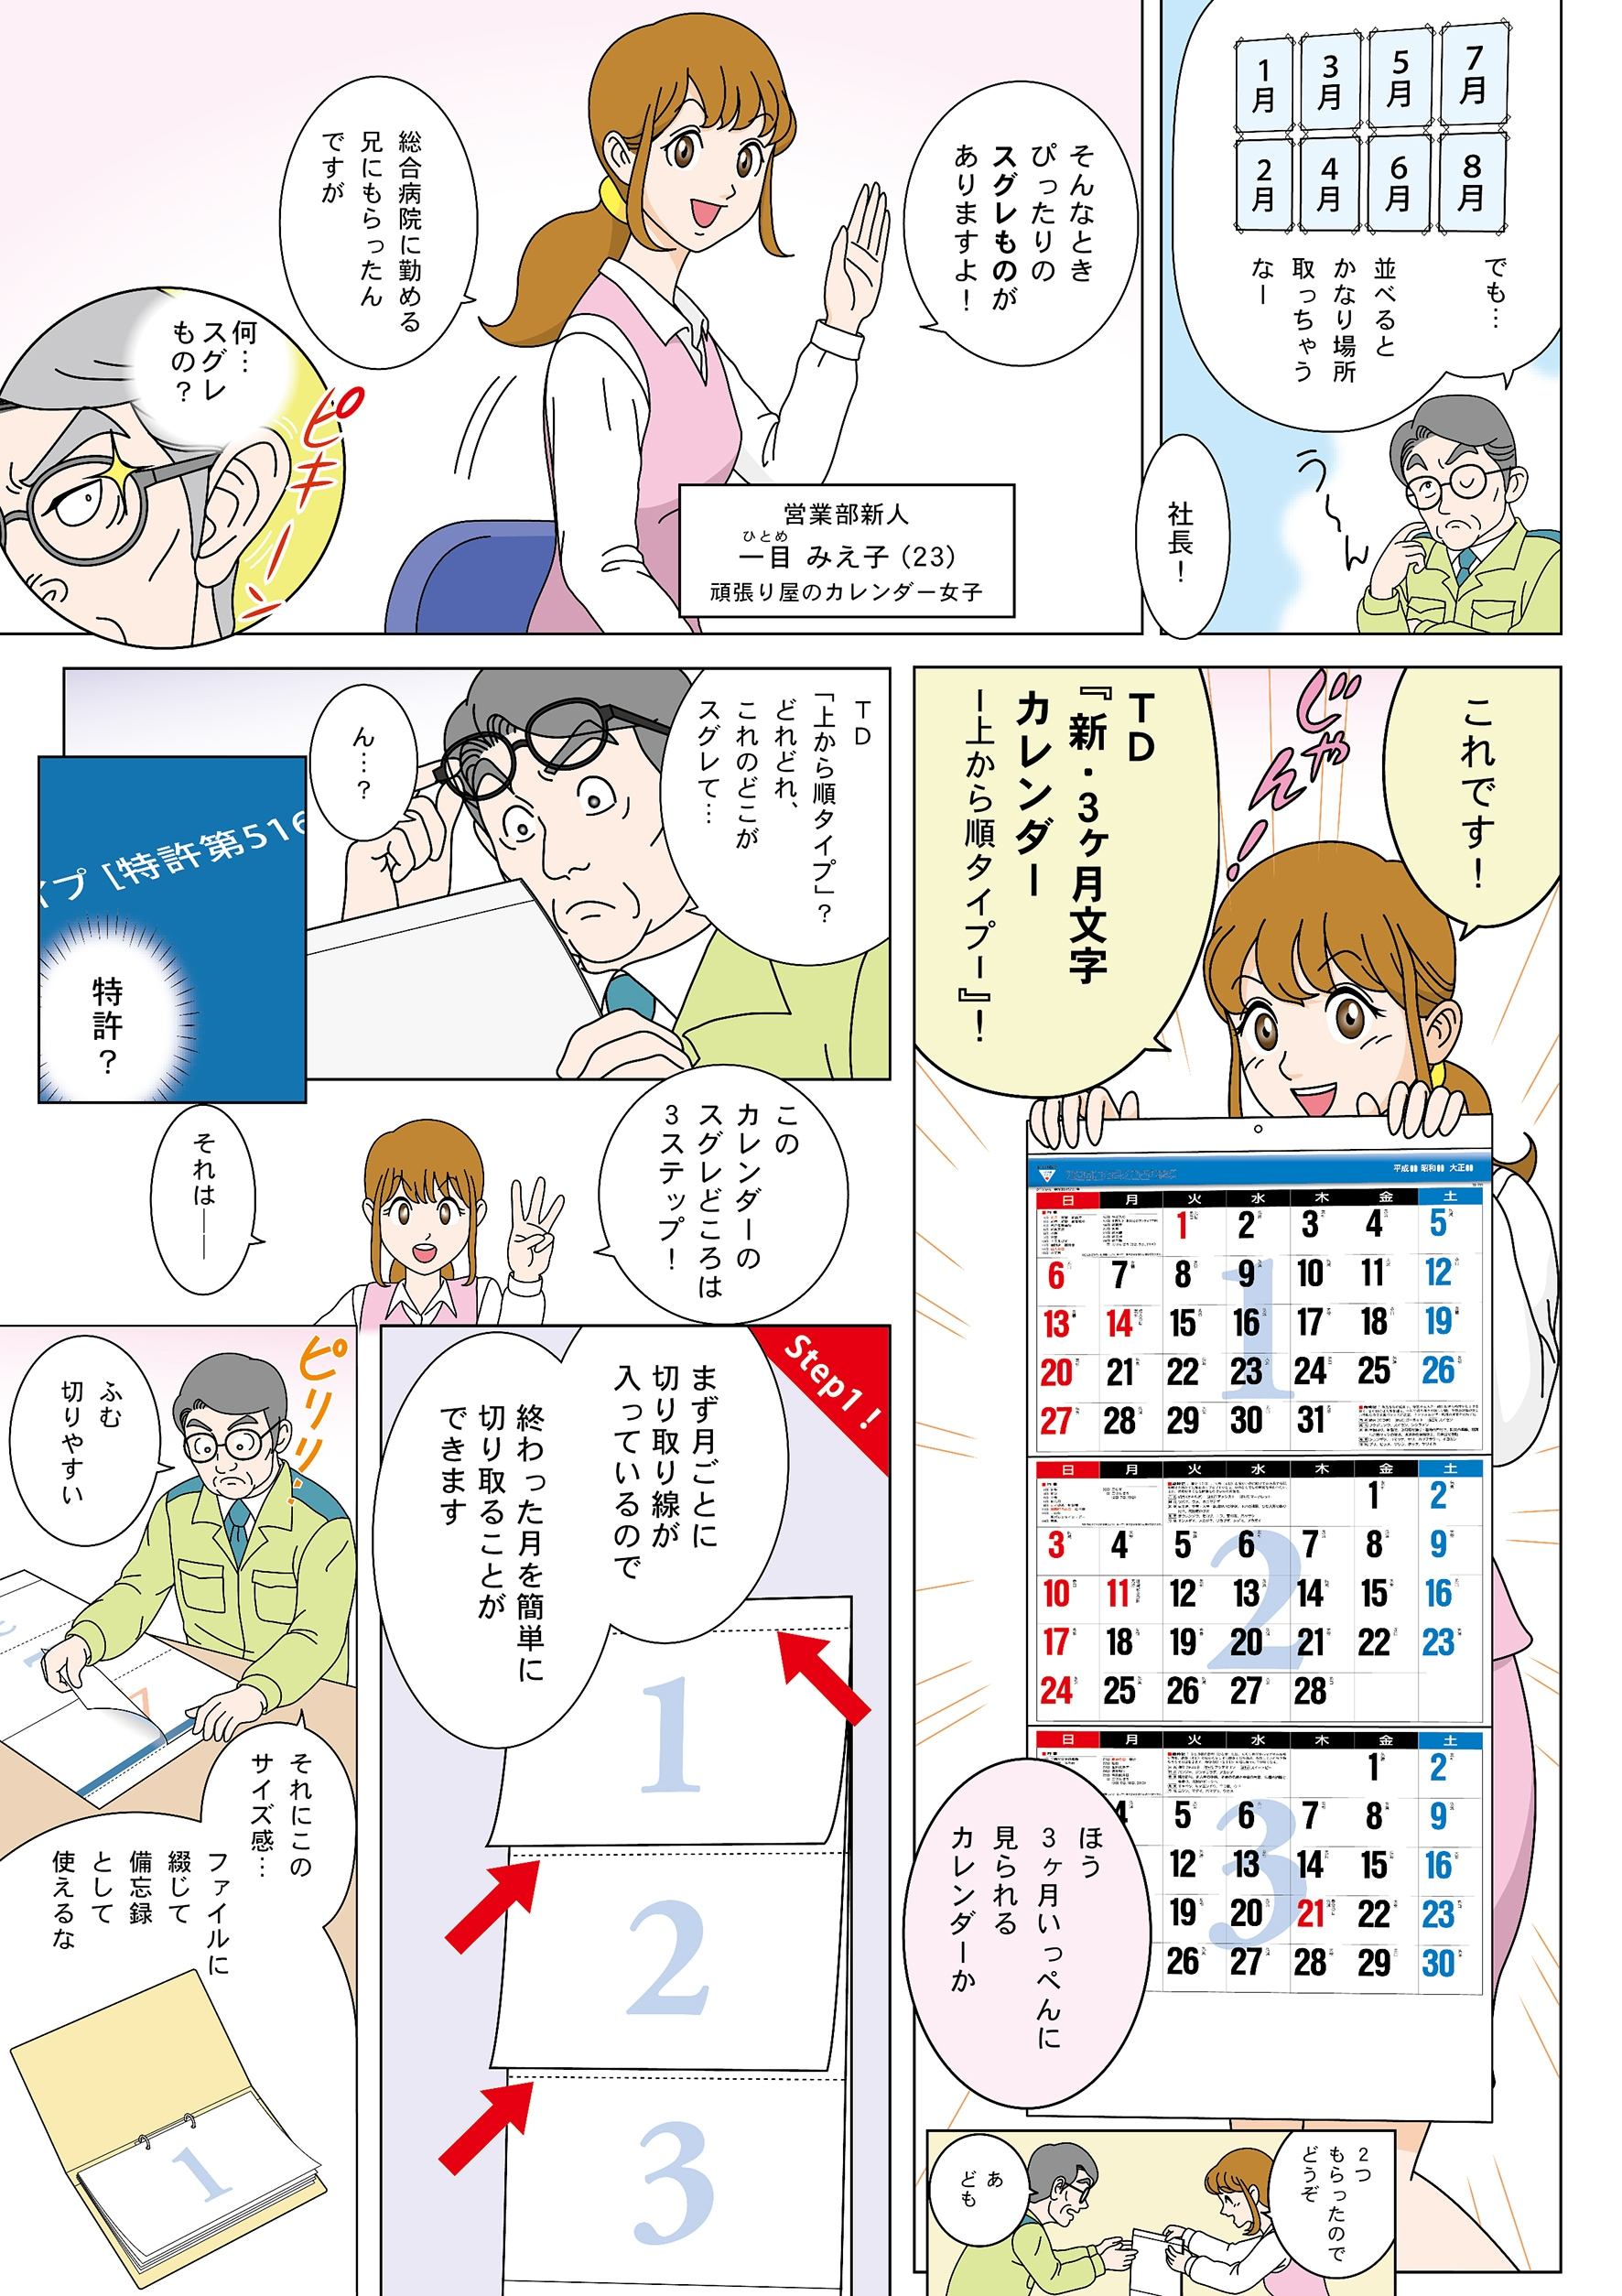 TD3ヶ月カレンダー物語